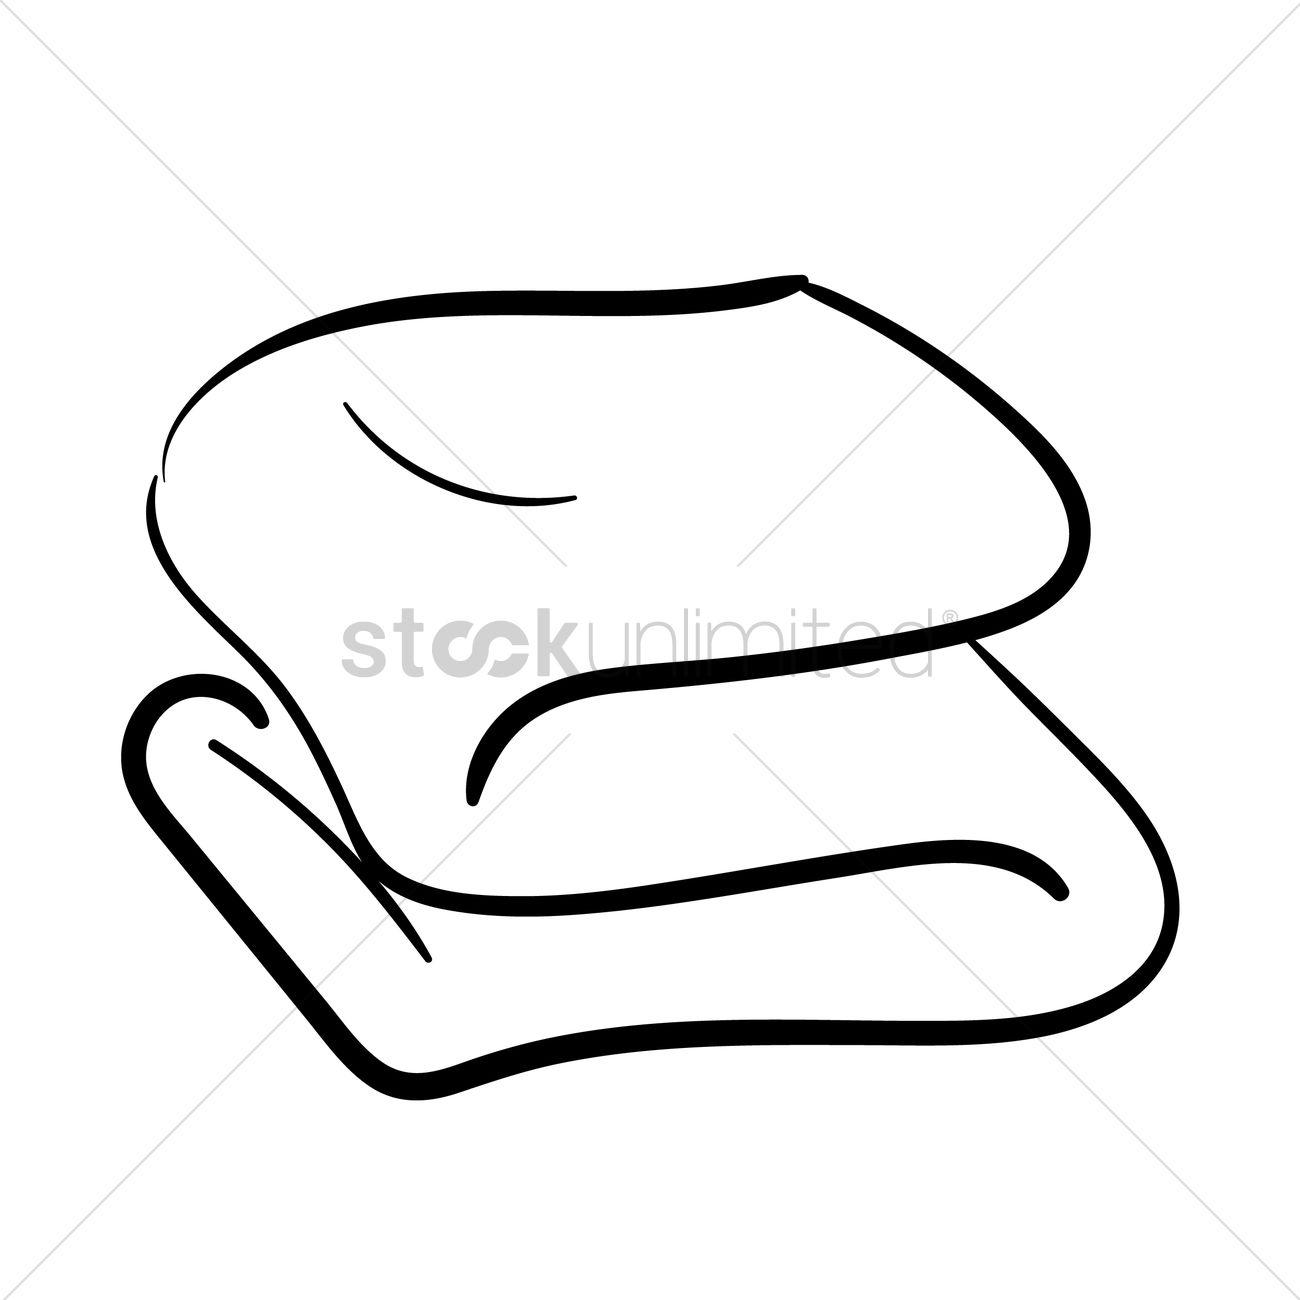 Folded Towel Vector Image